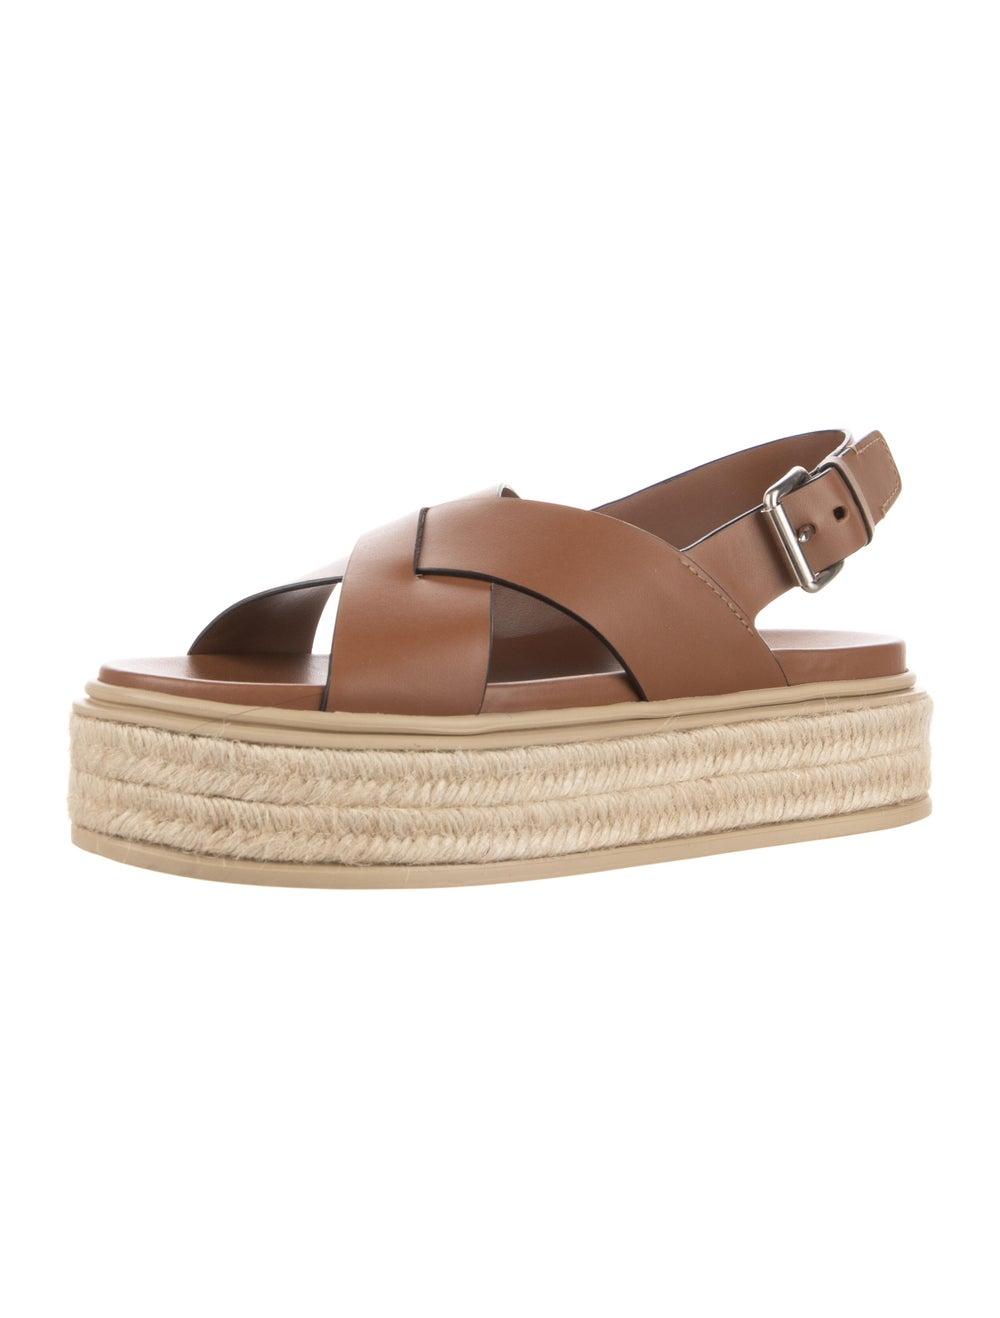 Prada Leather Espadrilles Brown - image 2